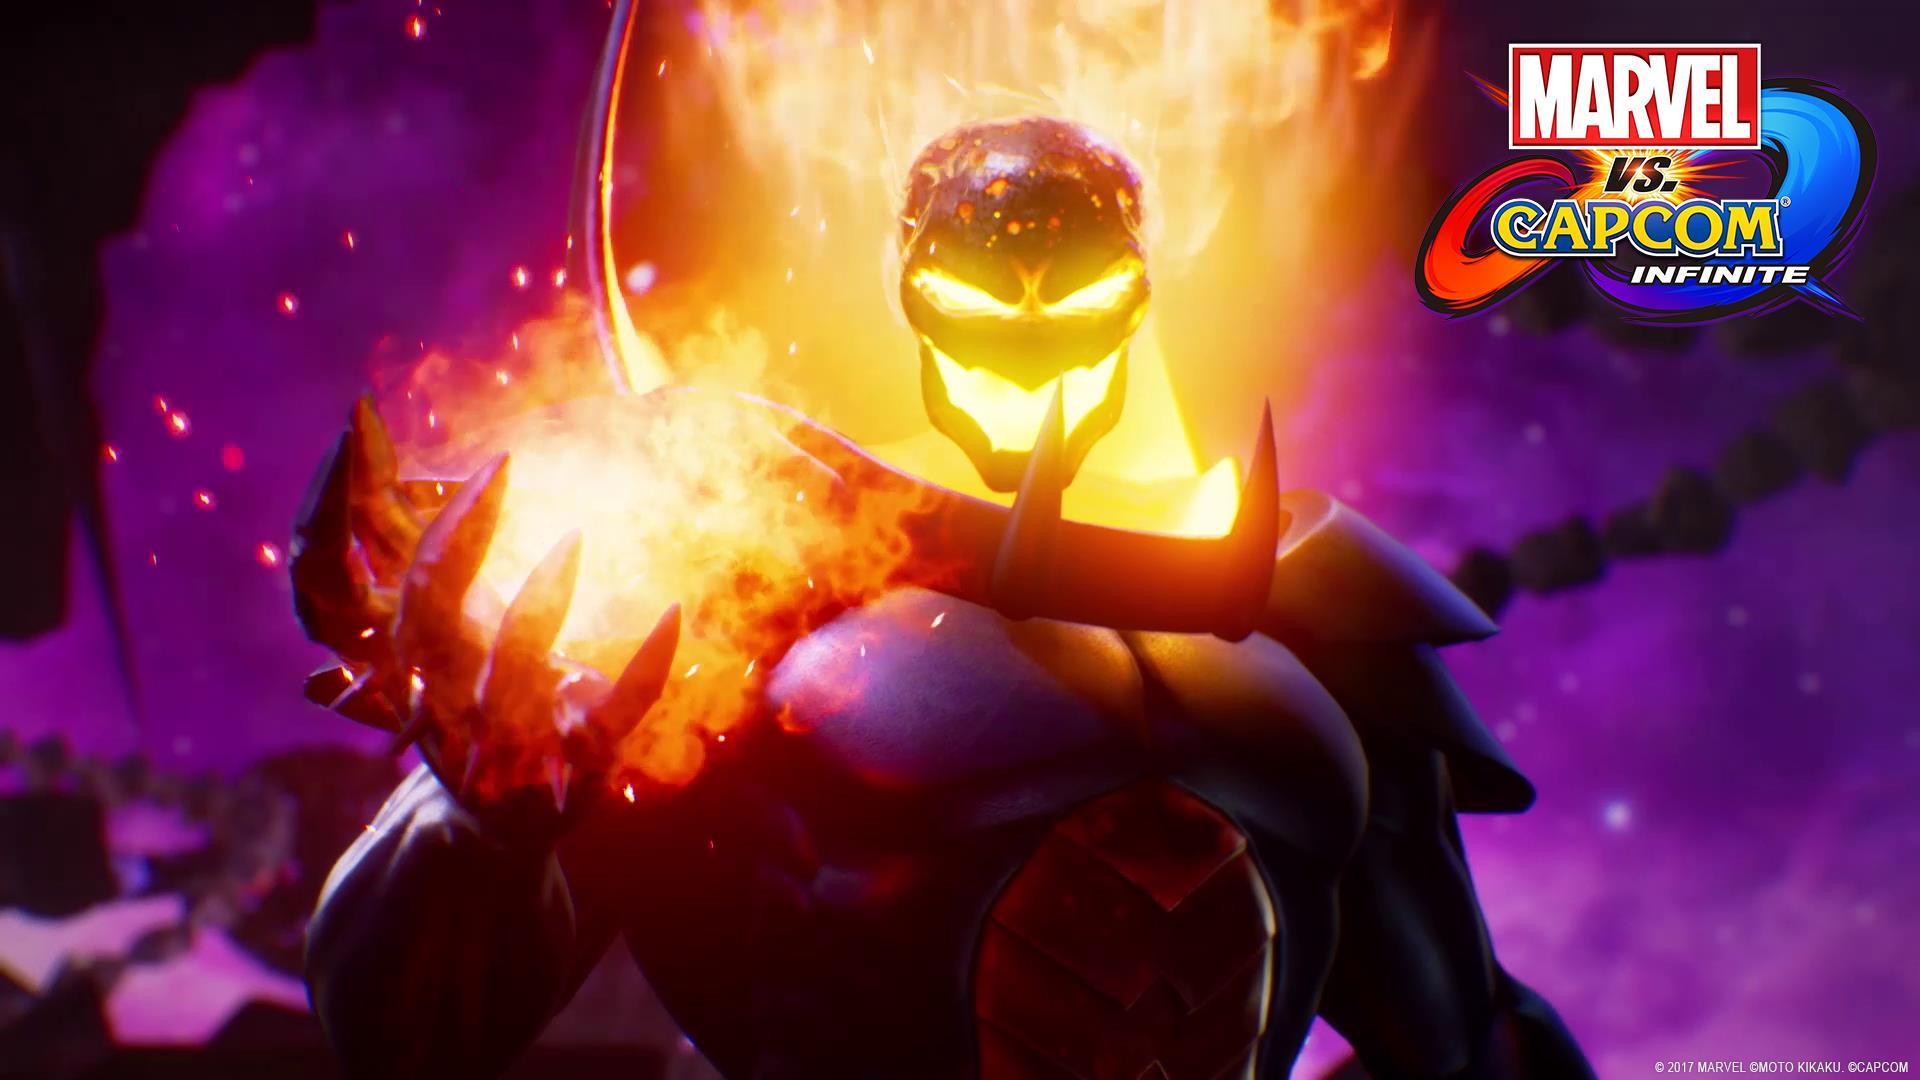 Image for Marvel vs. Capcom: Infinite gamescom trailer shows Ghost Rider and Dormammu tearing it up